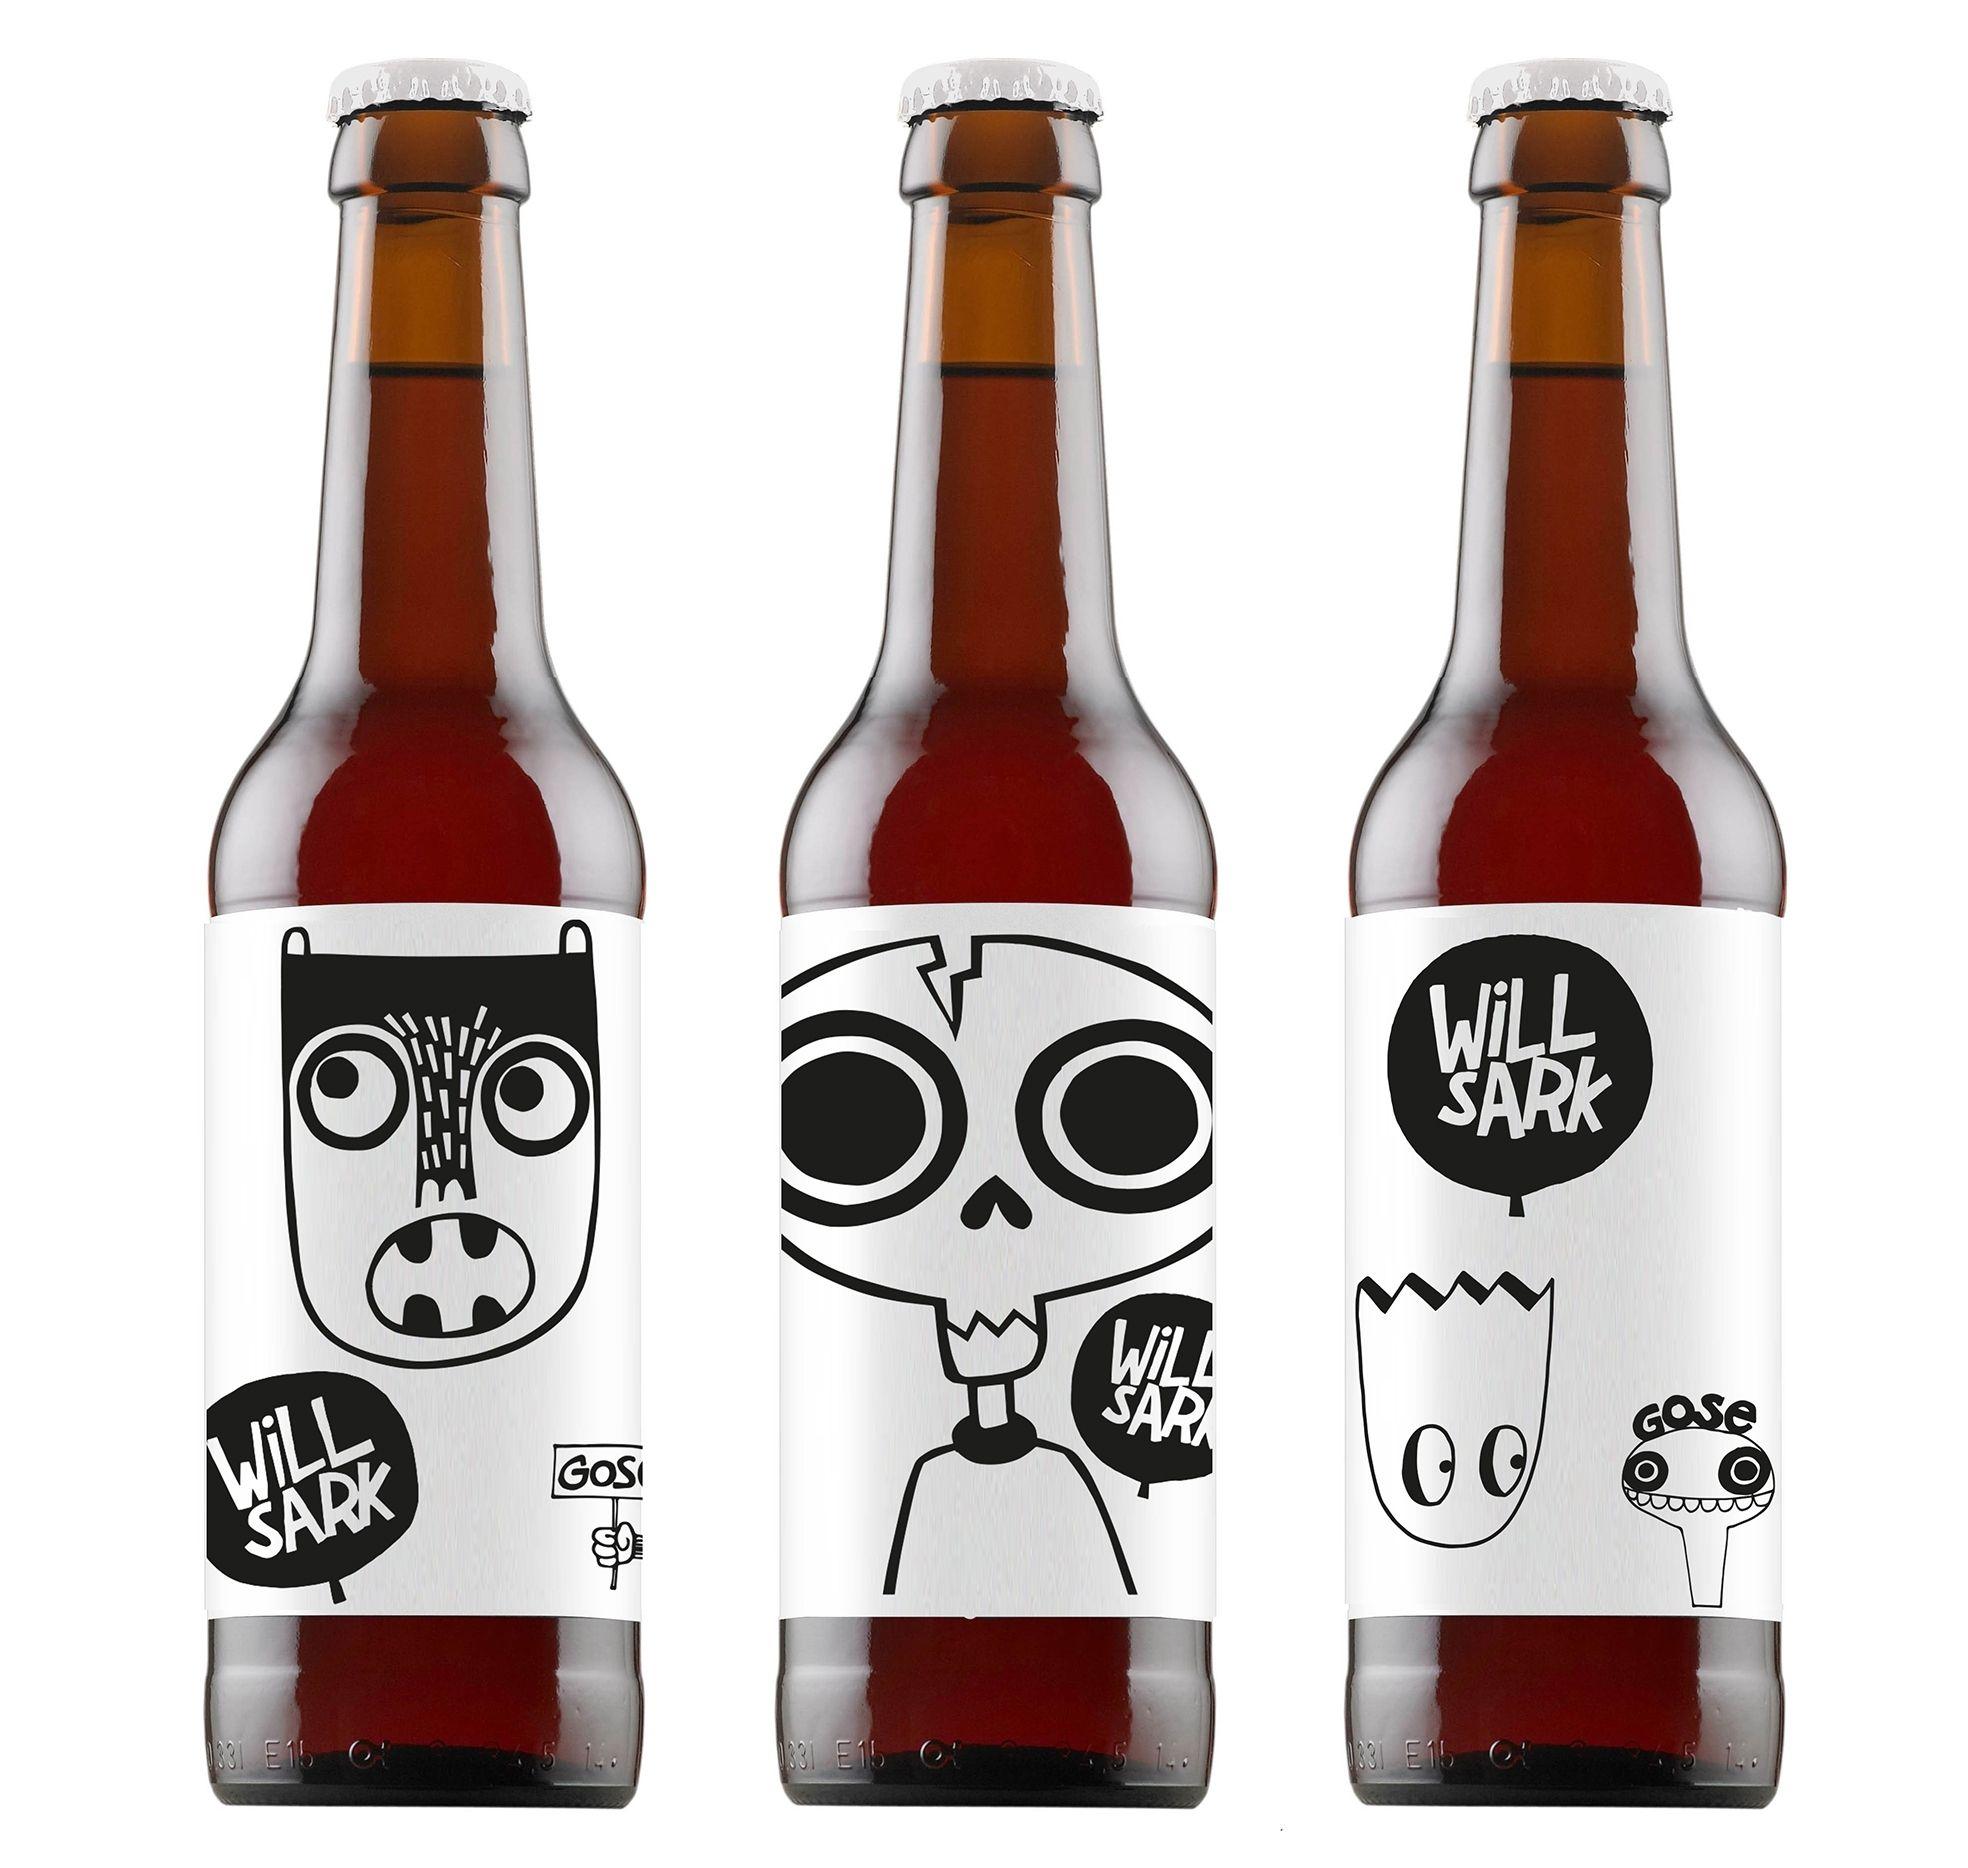 Willsark bier flesjes